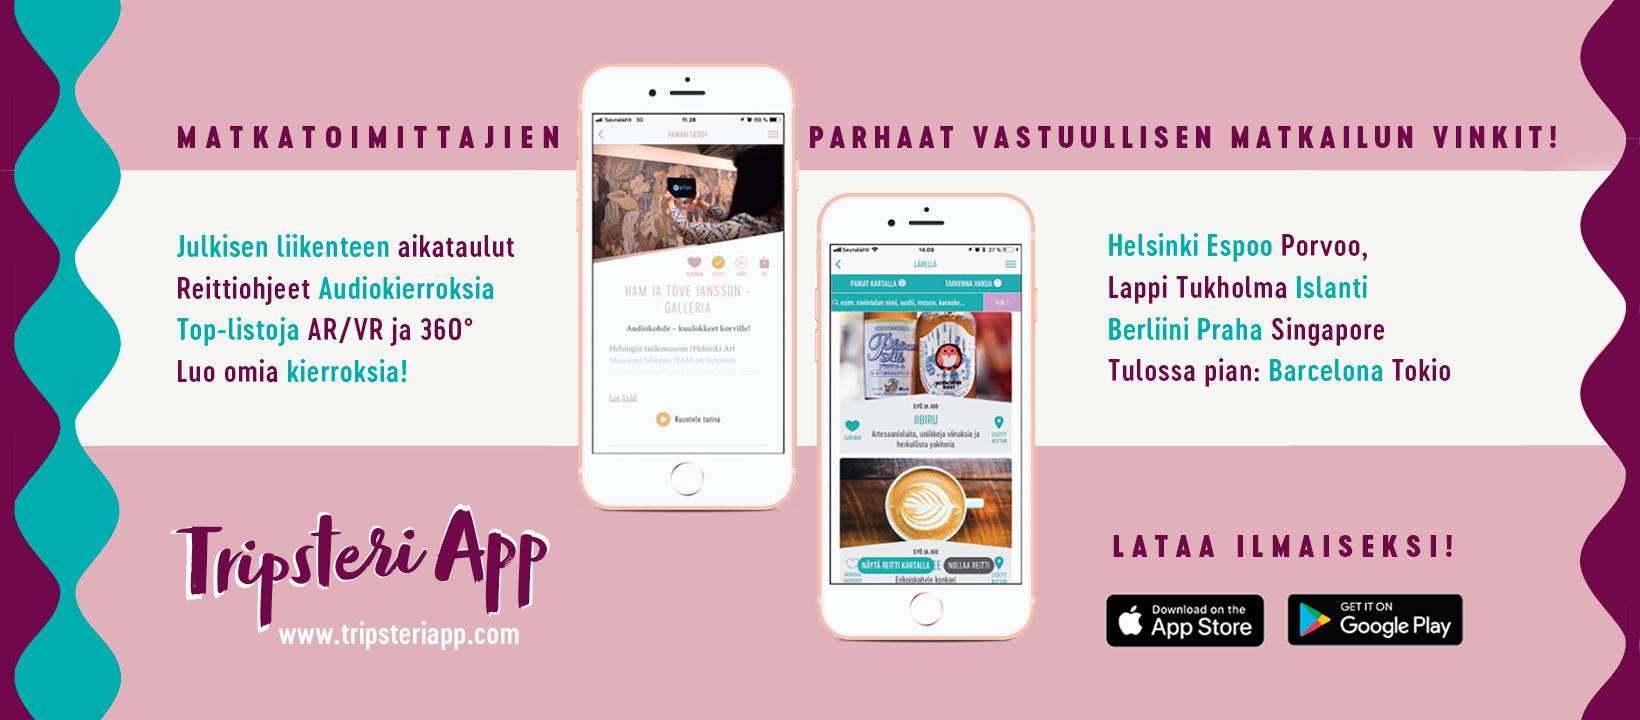 Tripsteri App -matkasovellus